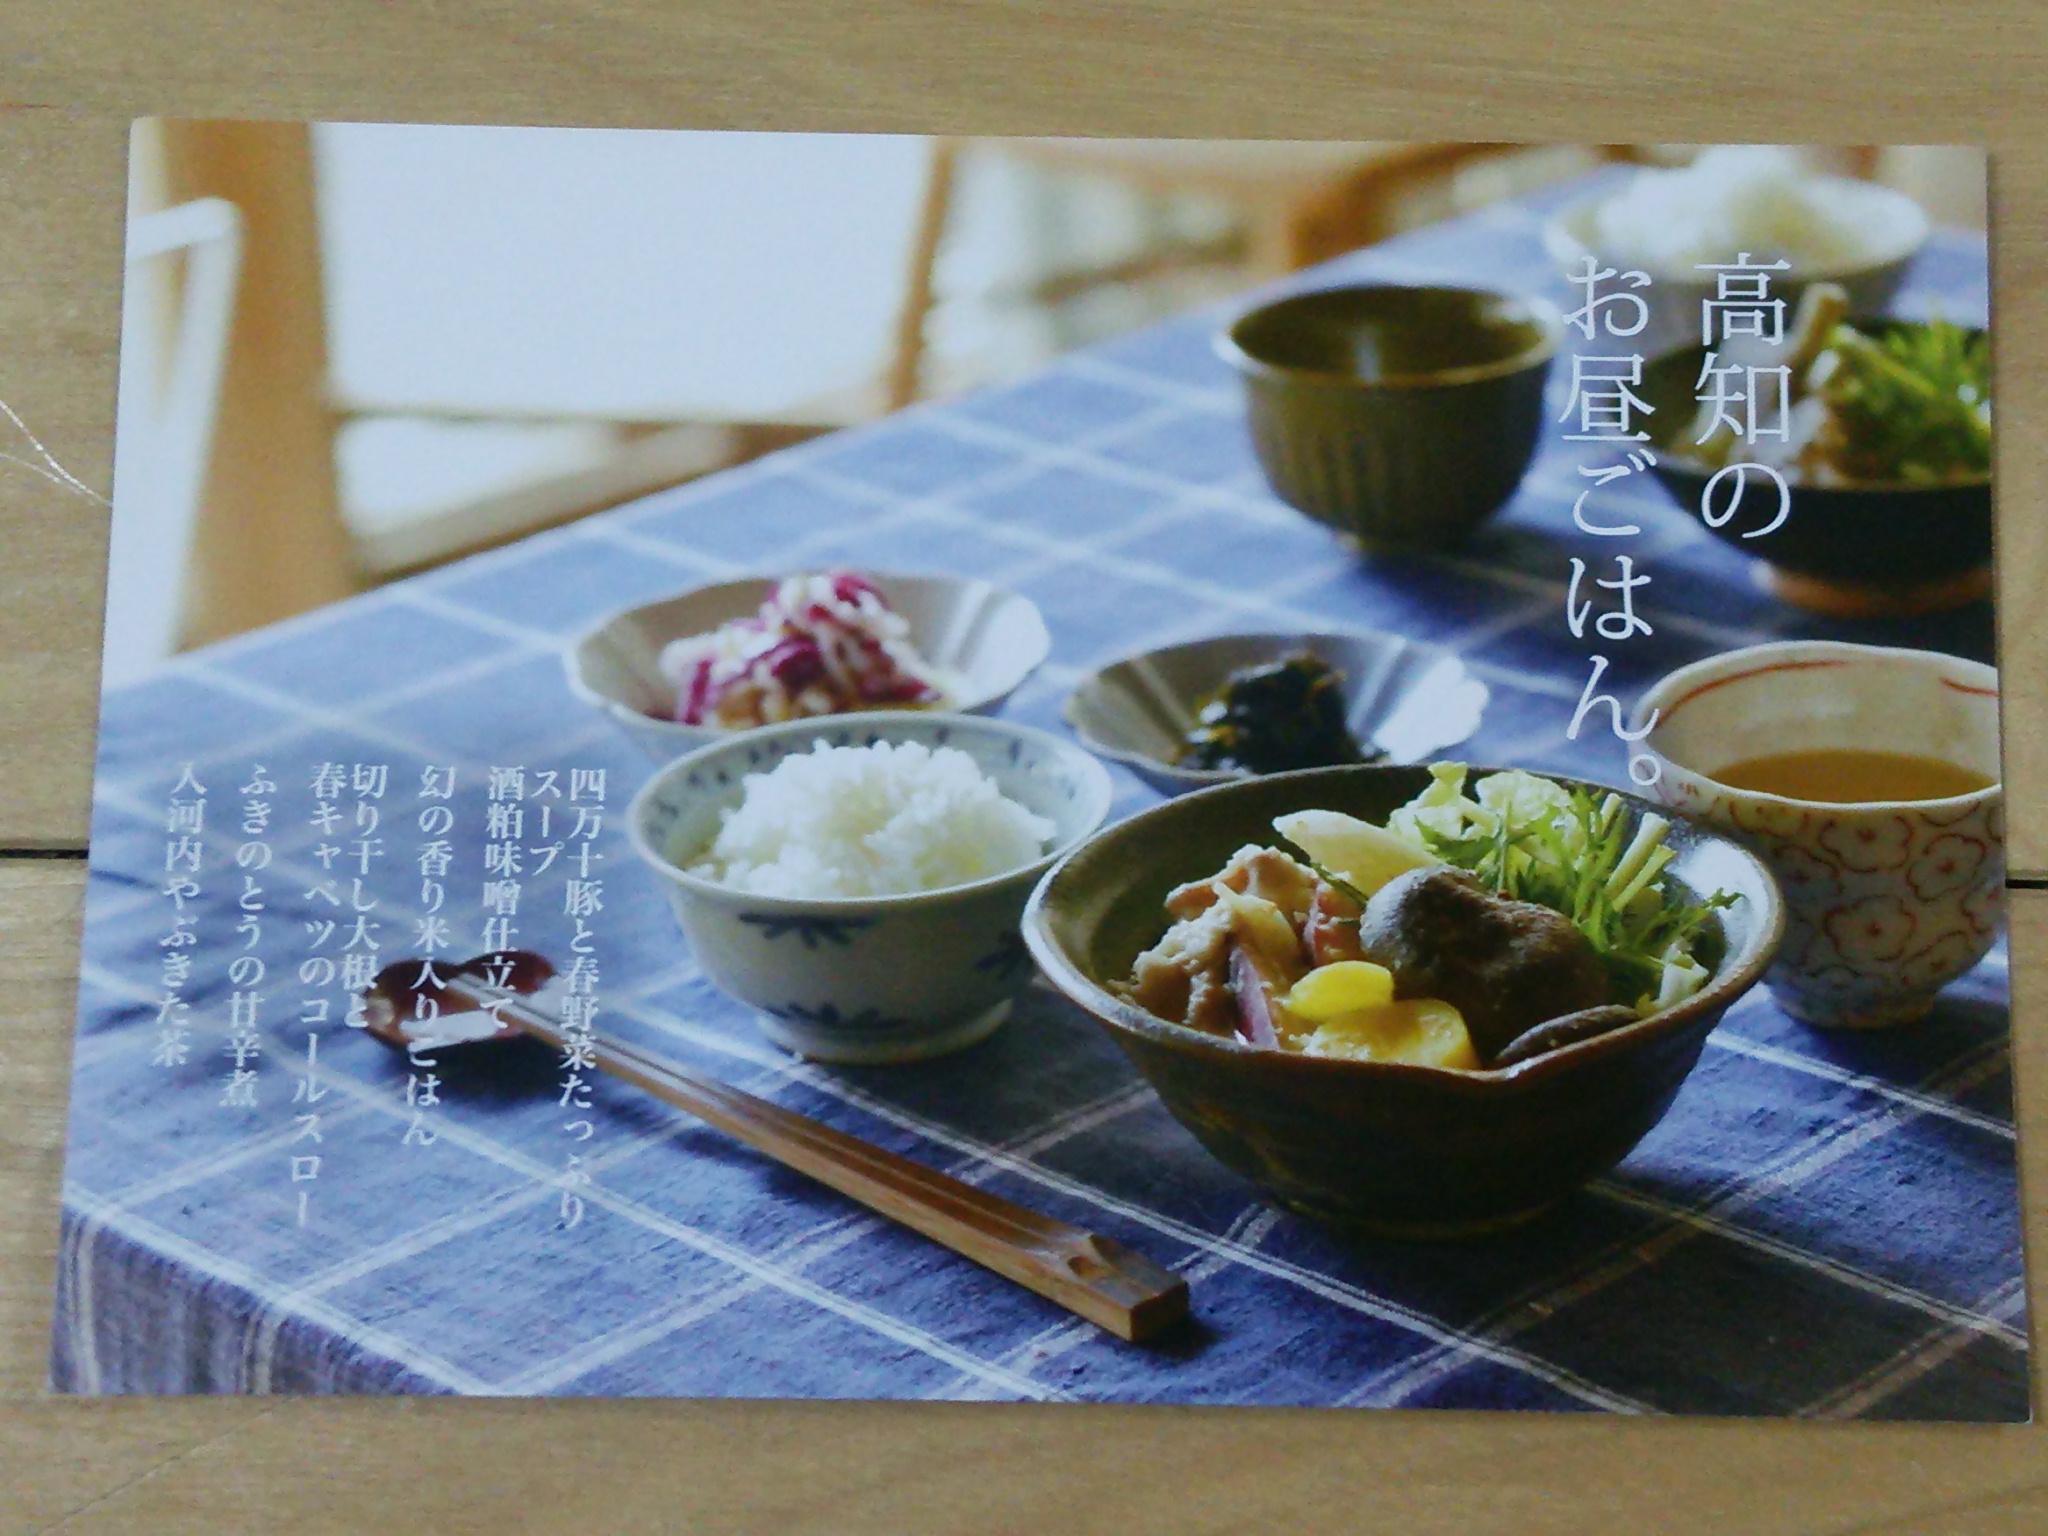 東京・二子玉川東急フードショー「Occatté」